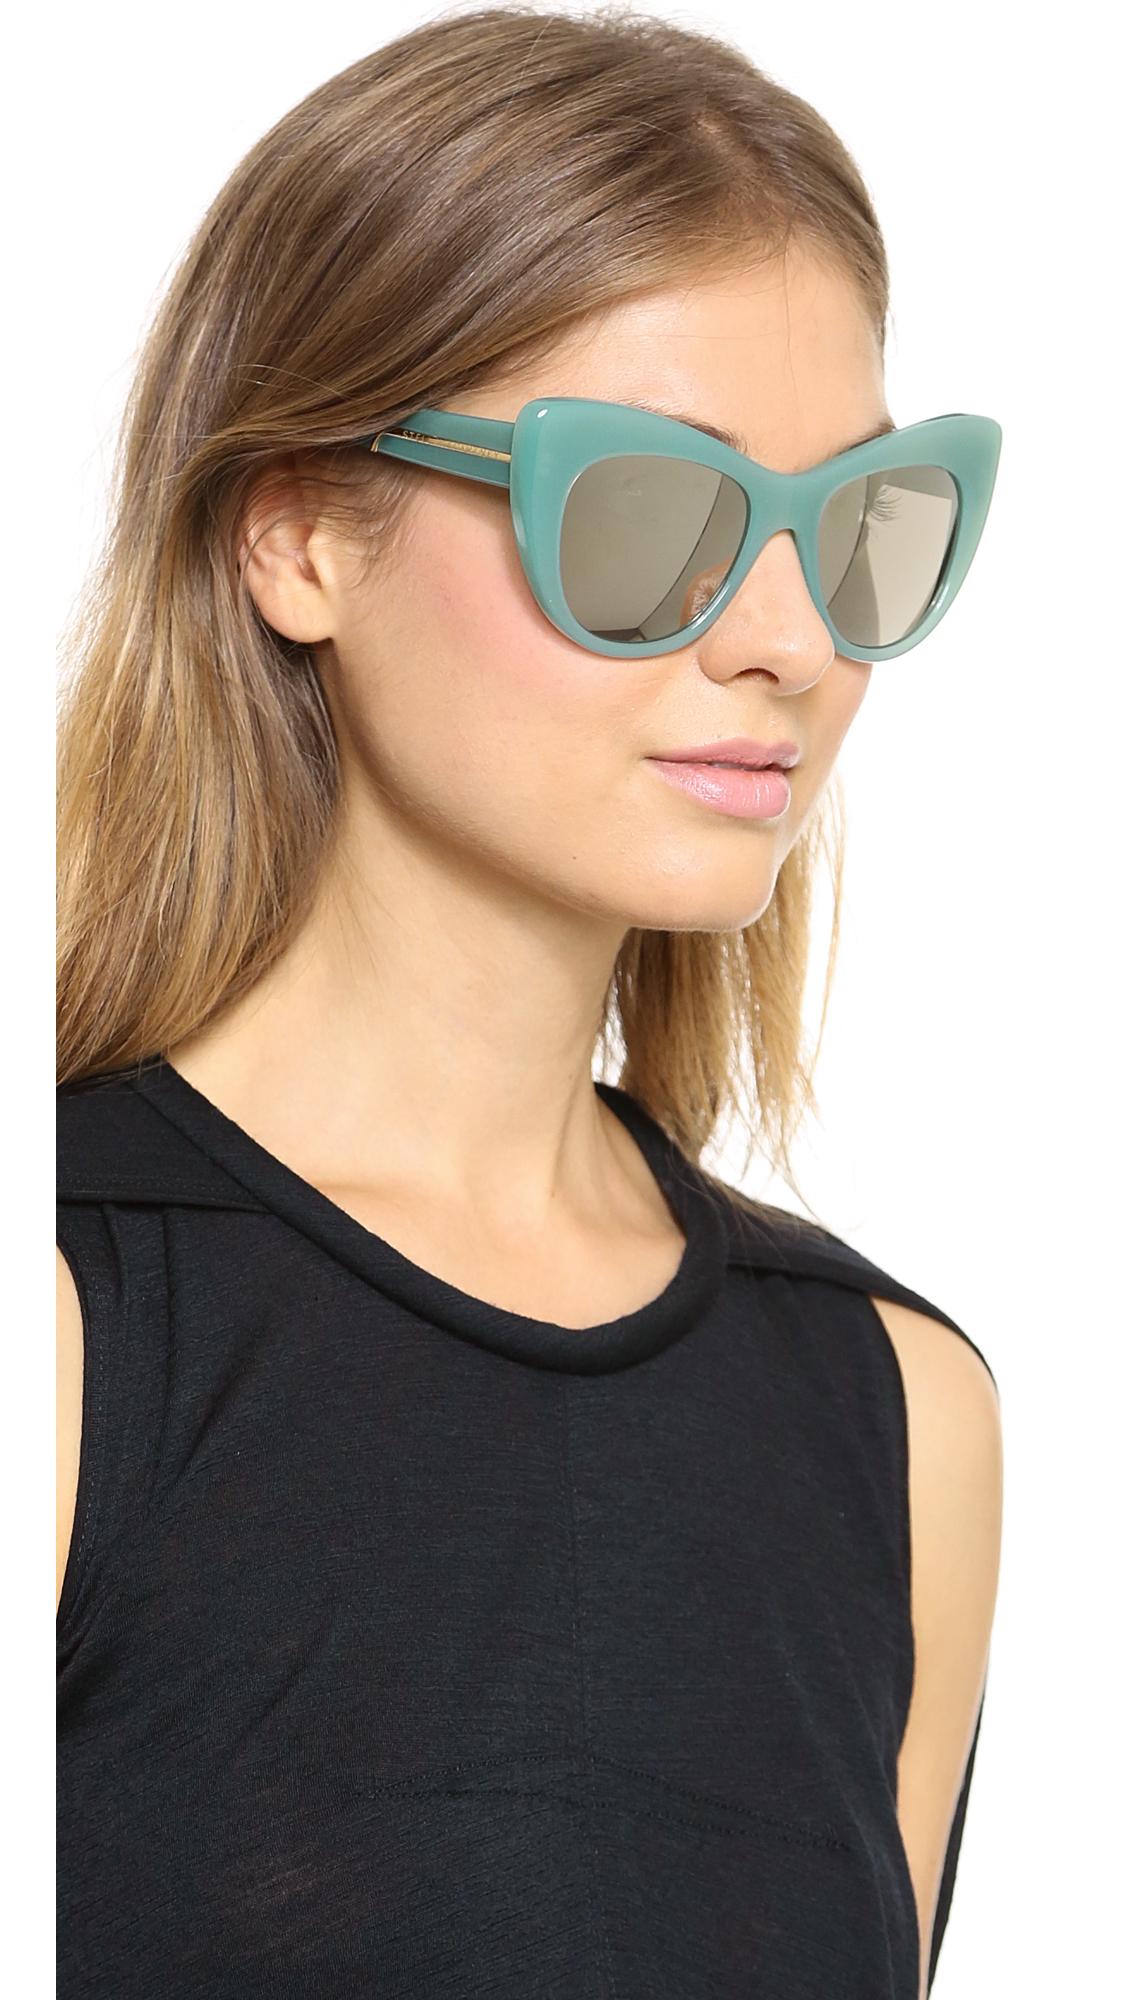 Stella Mccartney Cat Eye Sunglasses Blue Celadon Gold